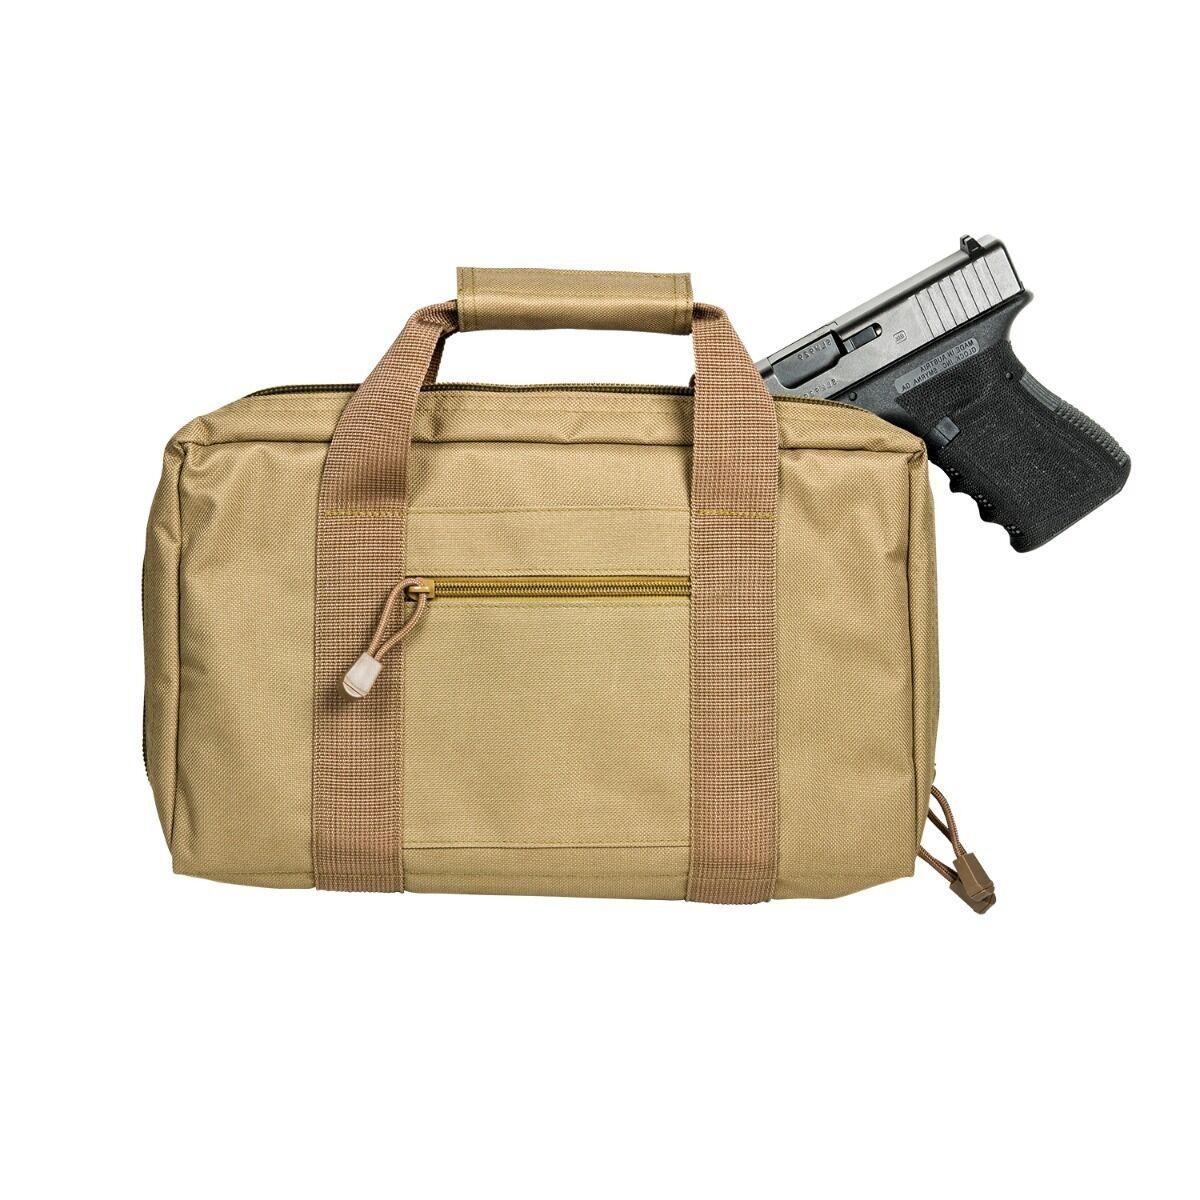 VISM CPT2903 Discreet Pistol Case - Tan